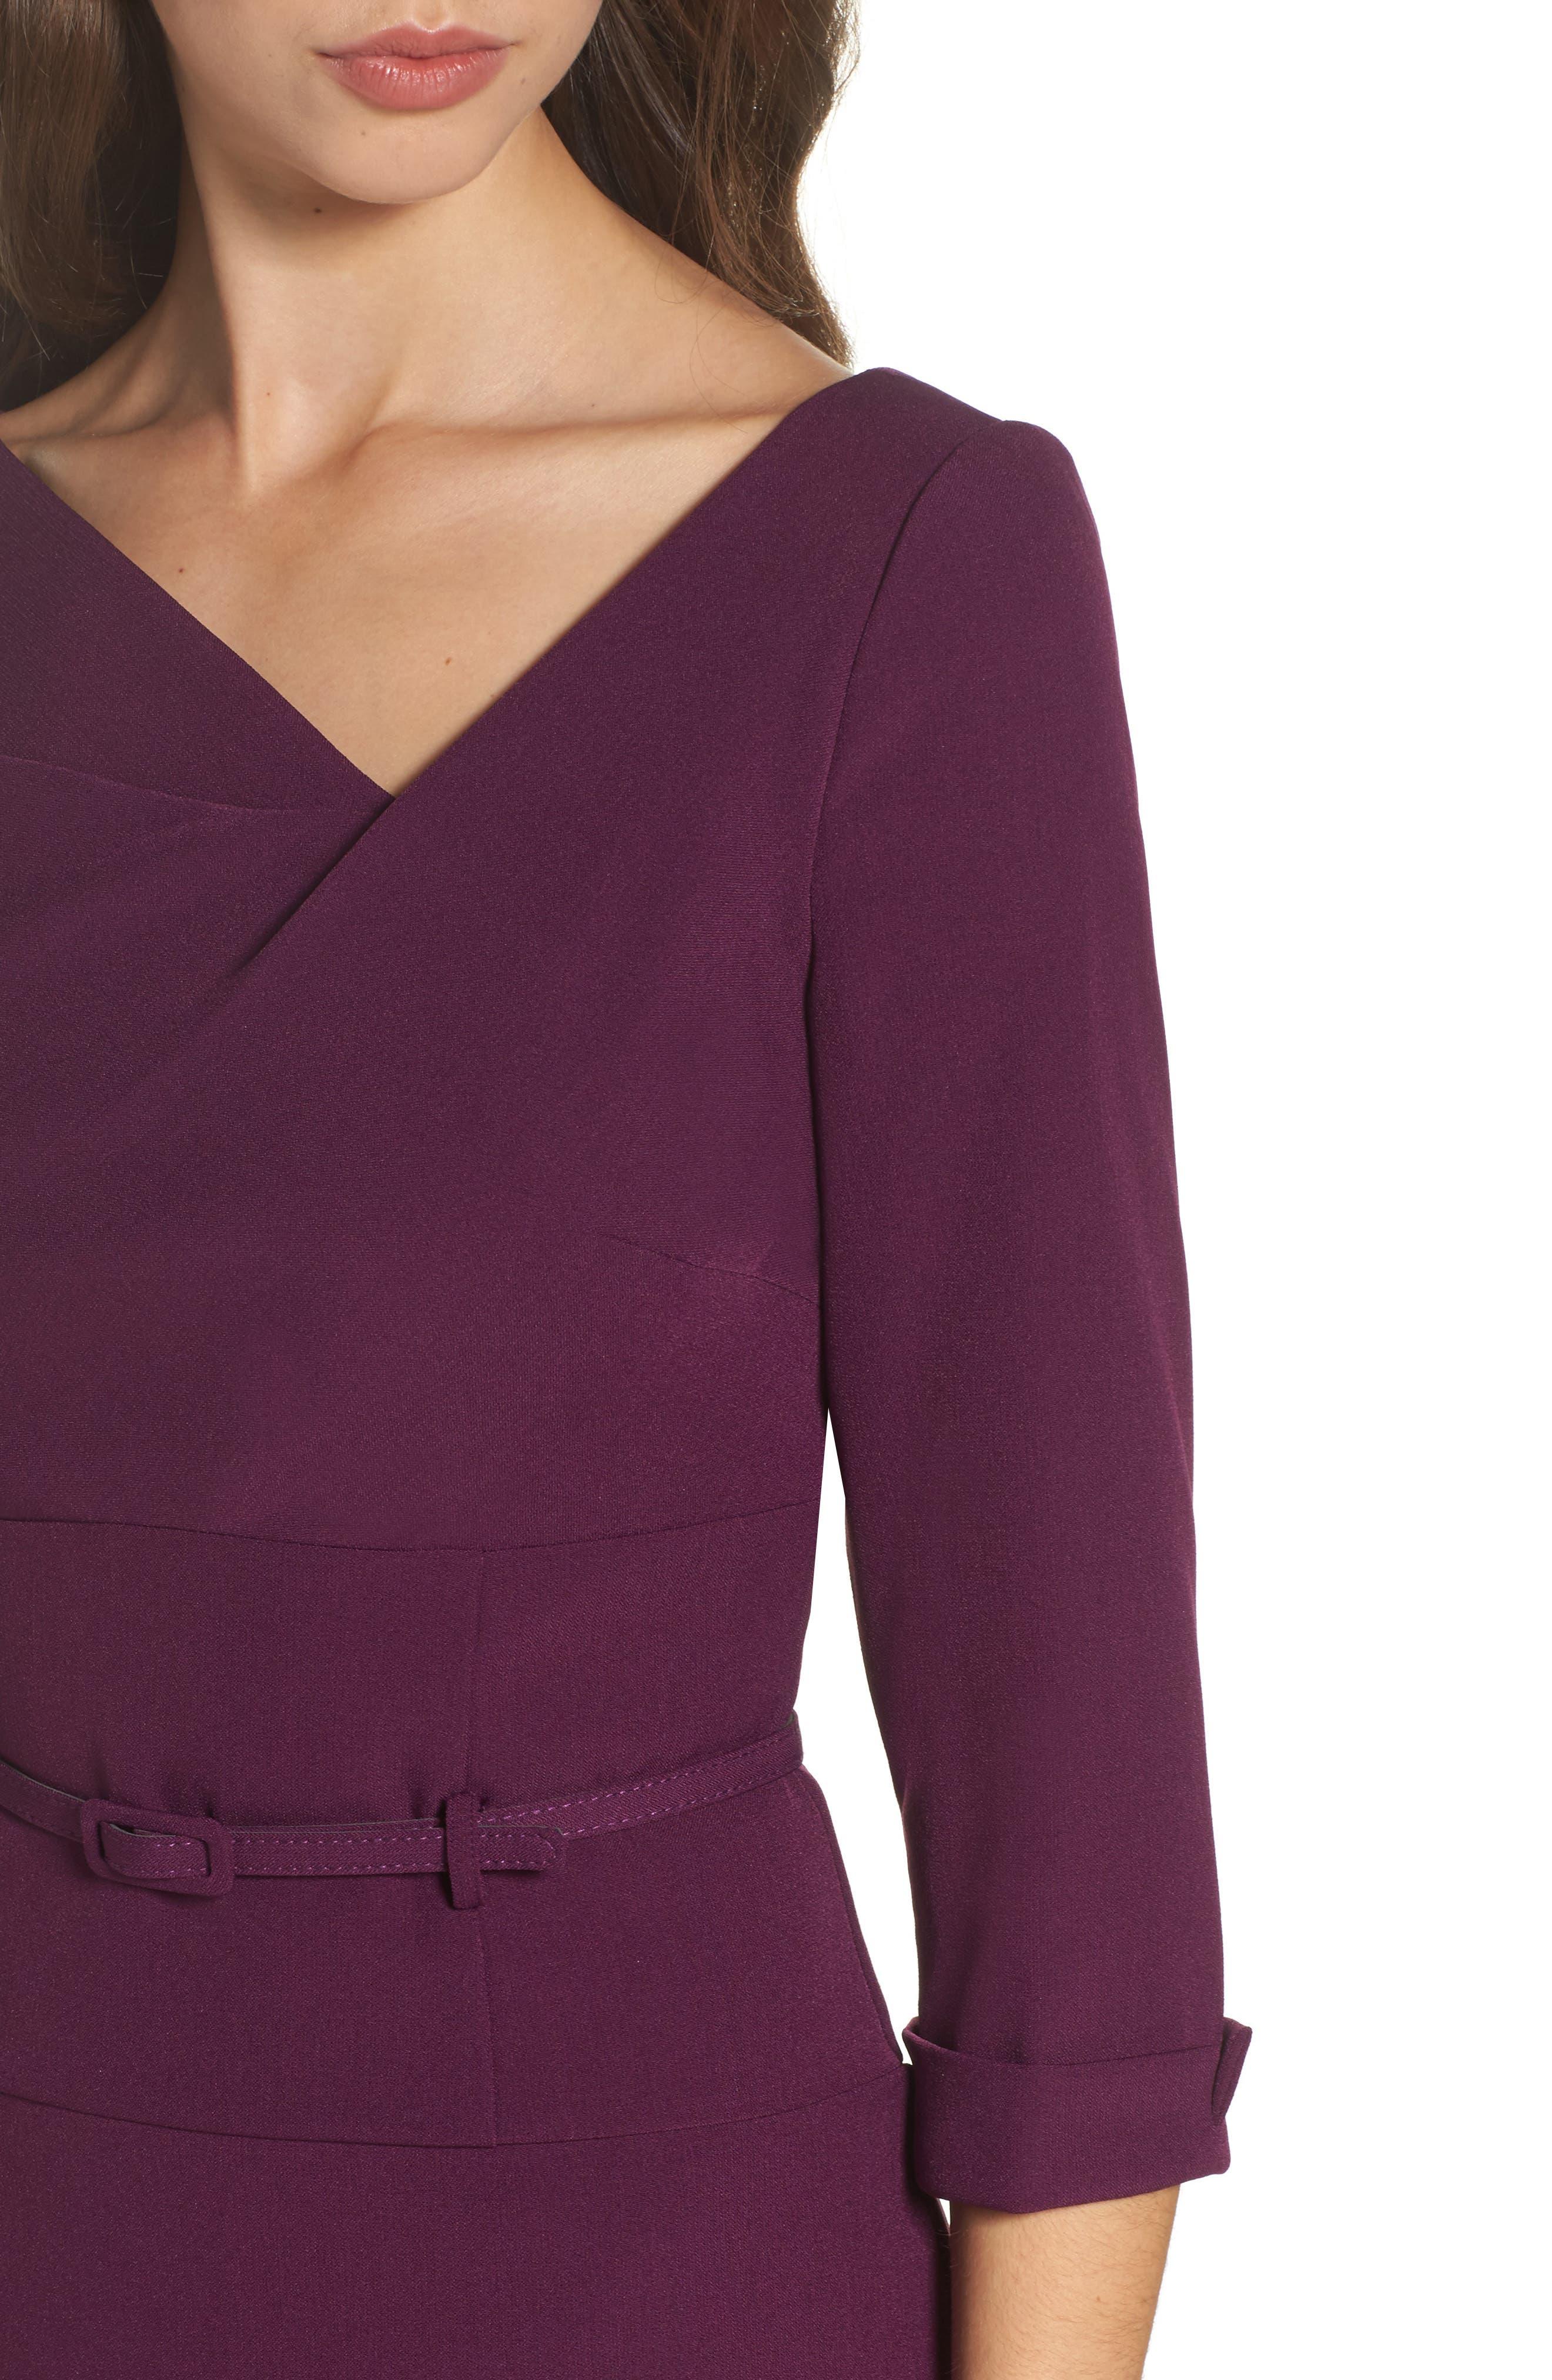 Belted Crepe Sheath Dress,                             Alternate thumbnail 4, color,                             606